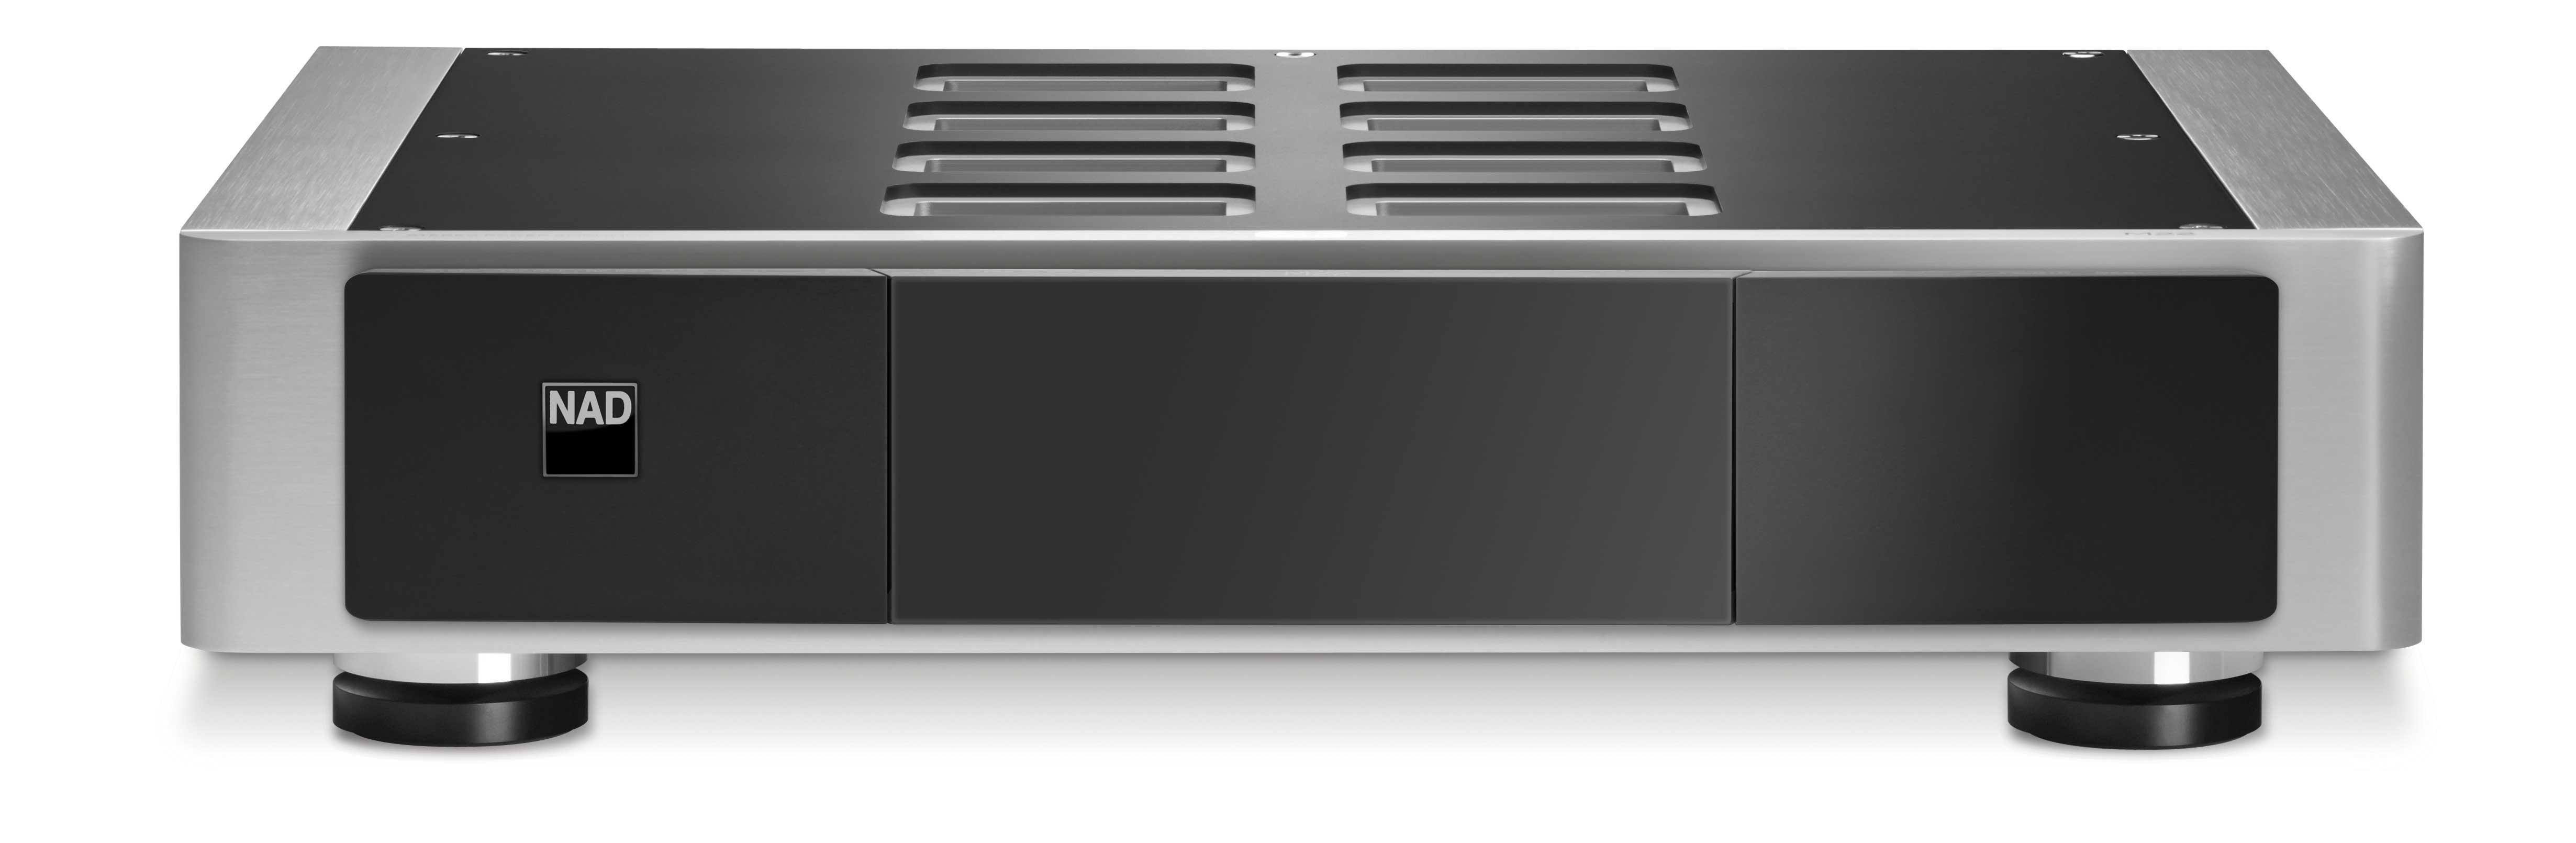 NAD Masters M22 V2 stereo päätevahvistin